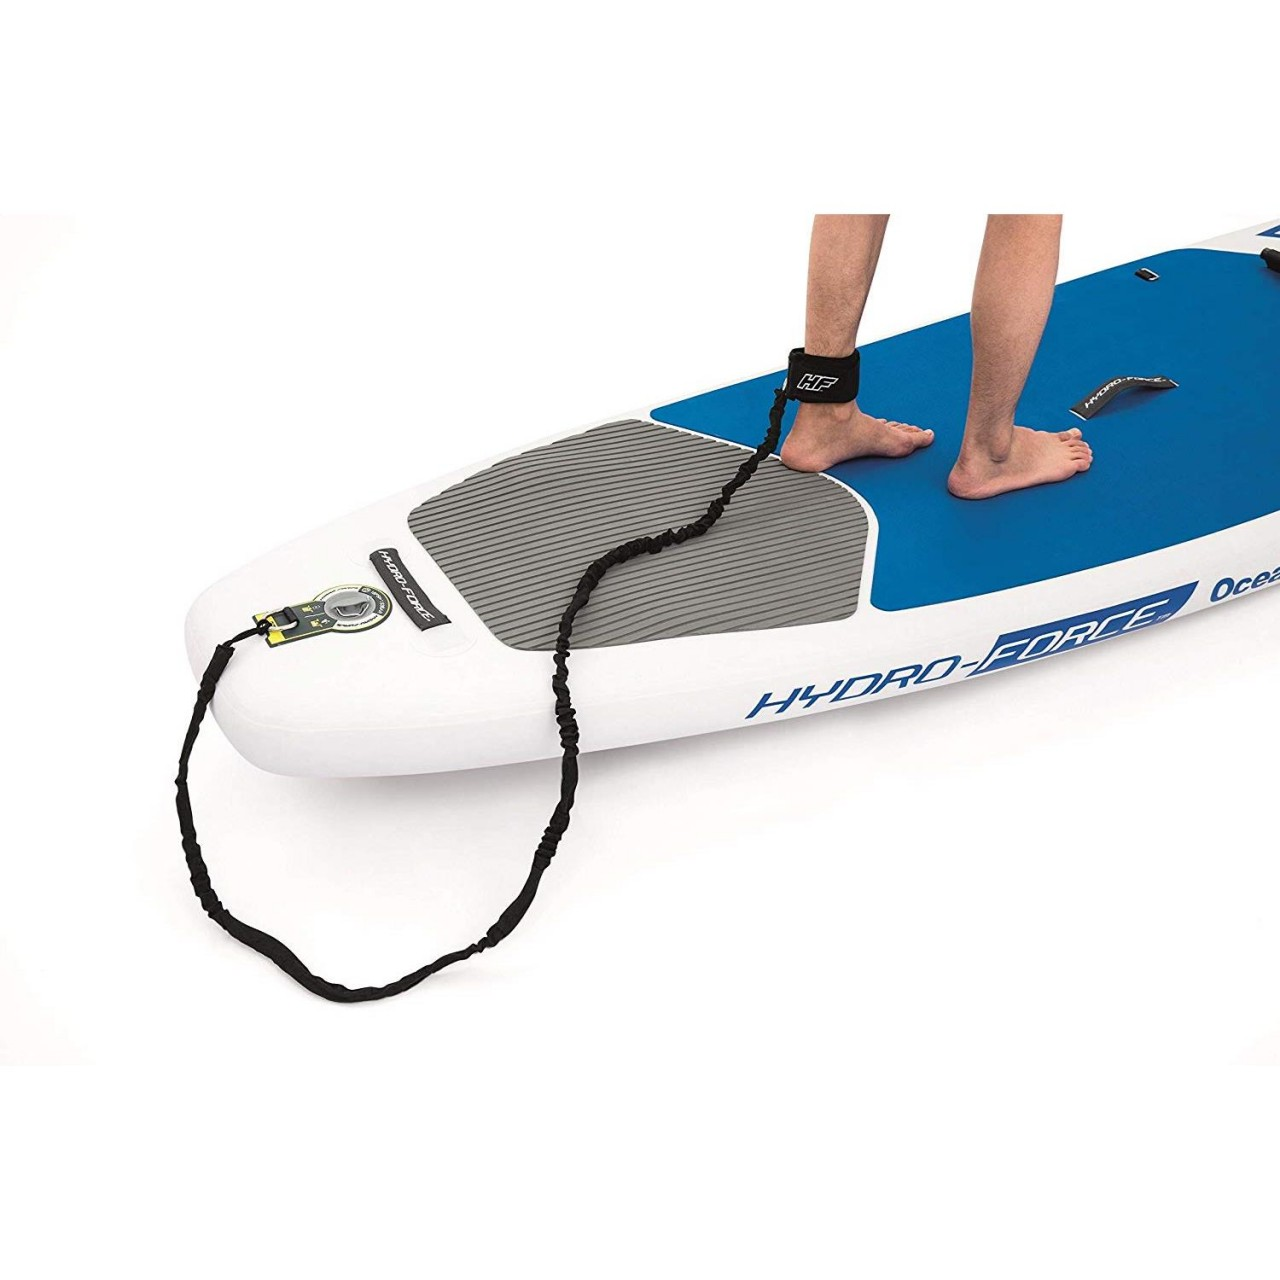 Bestway Hydro-Force SUP-Board aufblasbares Stand Up Paddelboard Oceana 65303